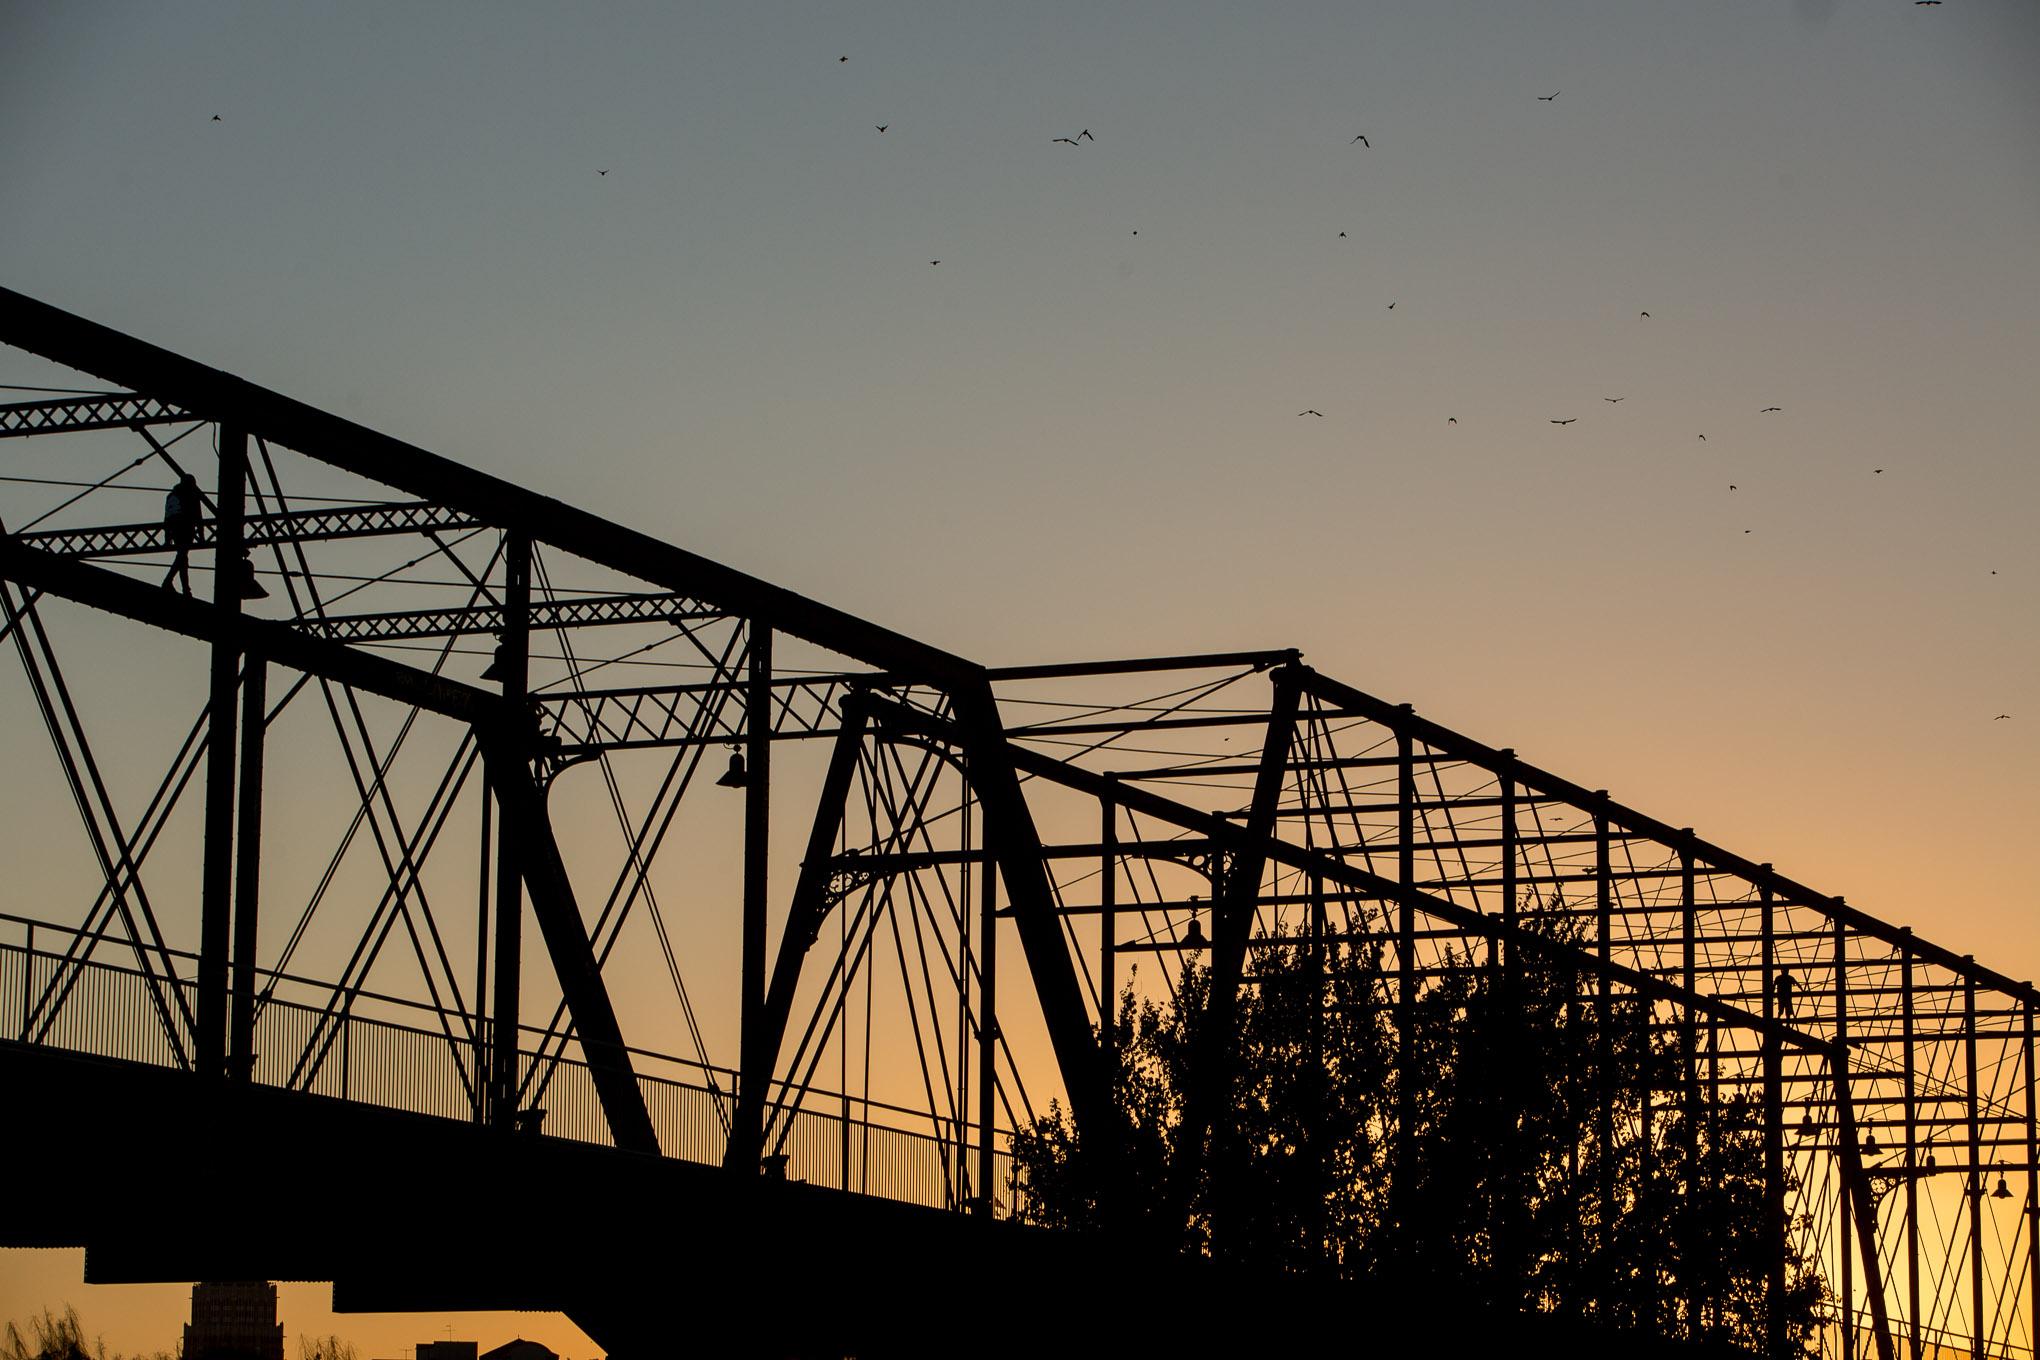 The sun sets over the Hays Street Bridge.